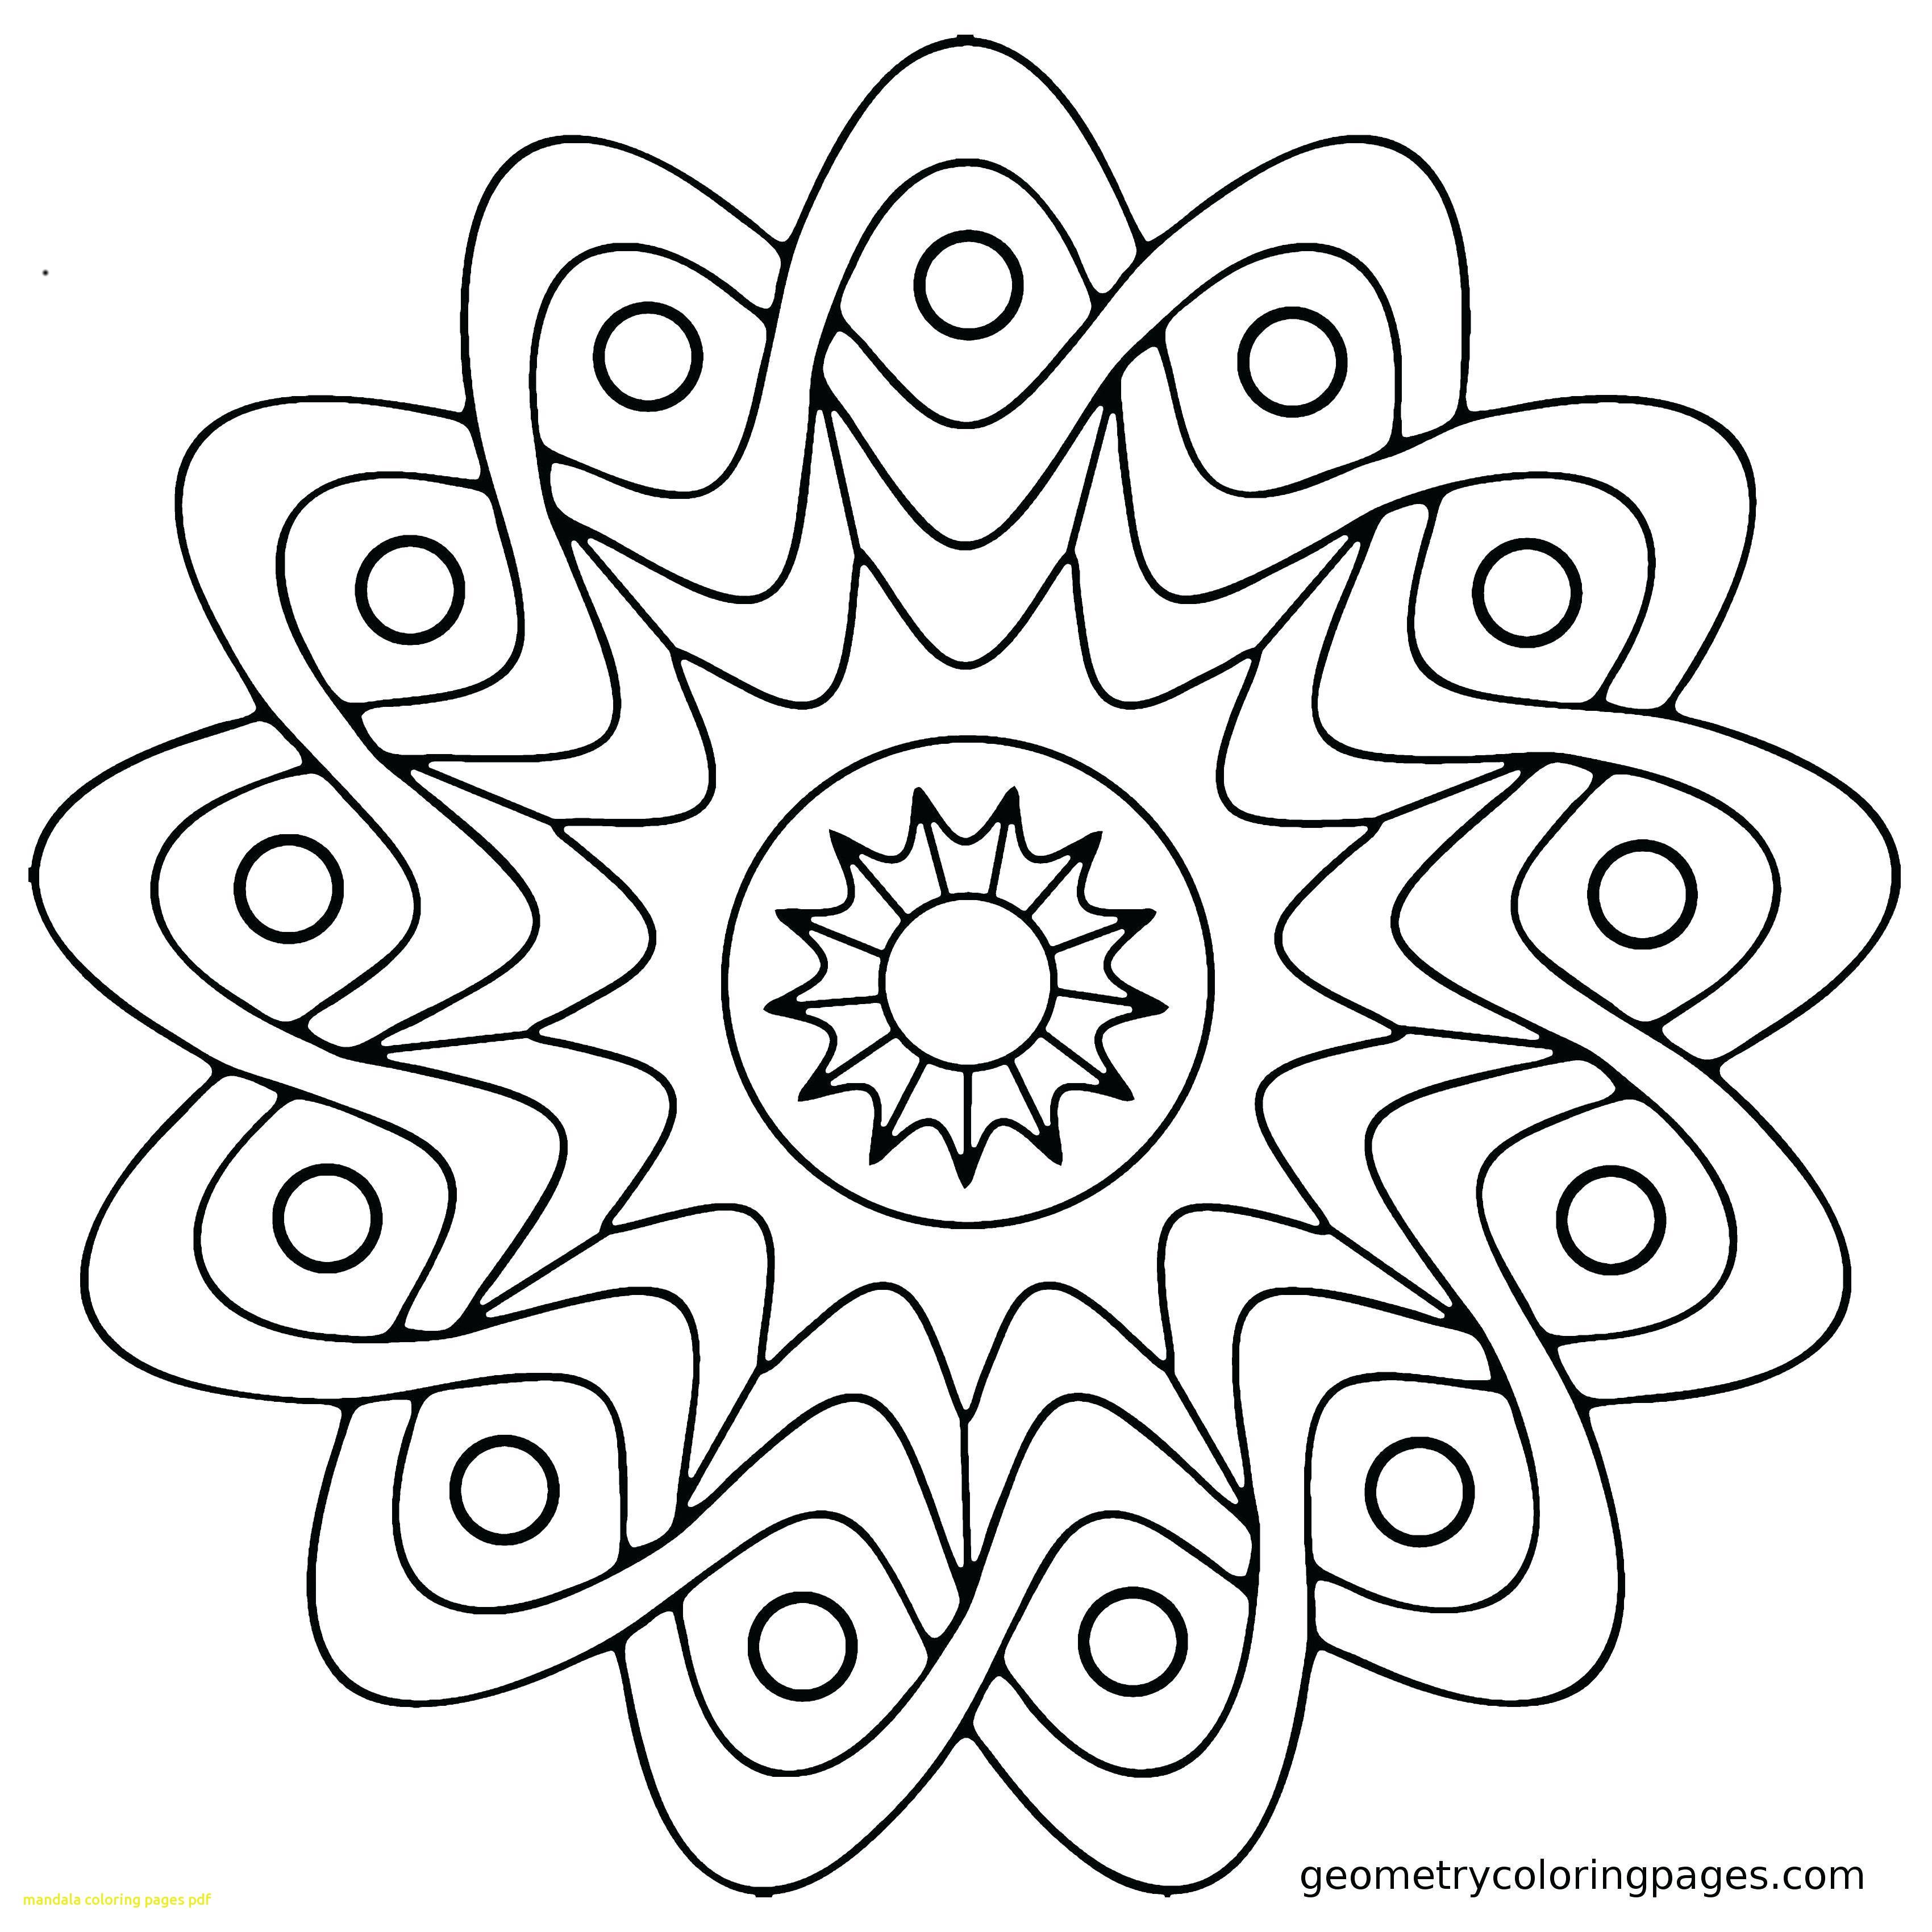 3400x3400 Mandala Coloring Pages Pdf